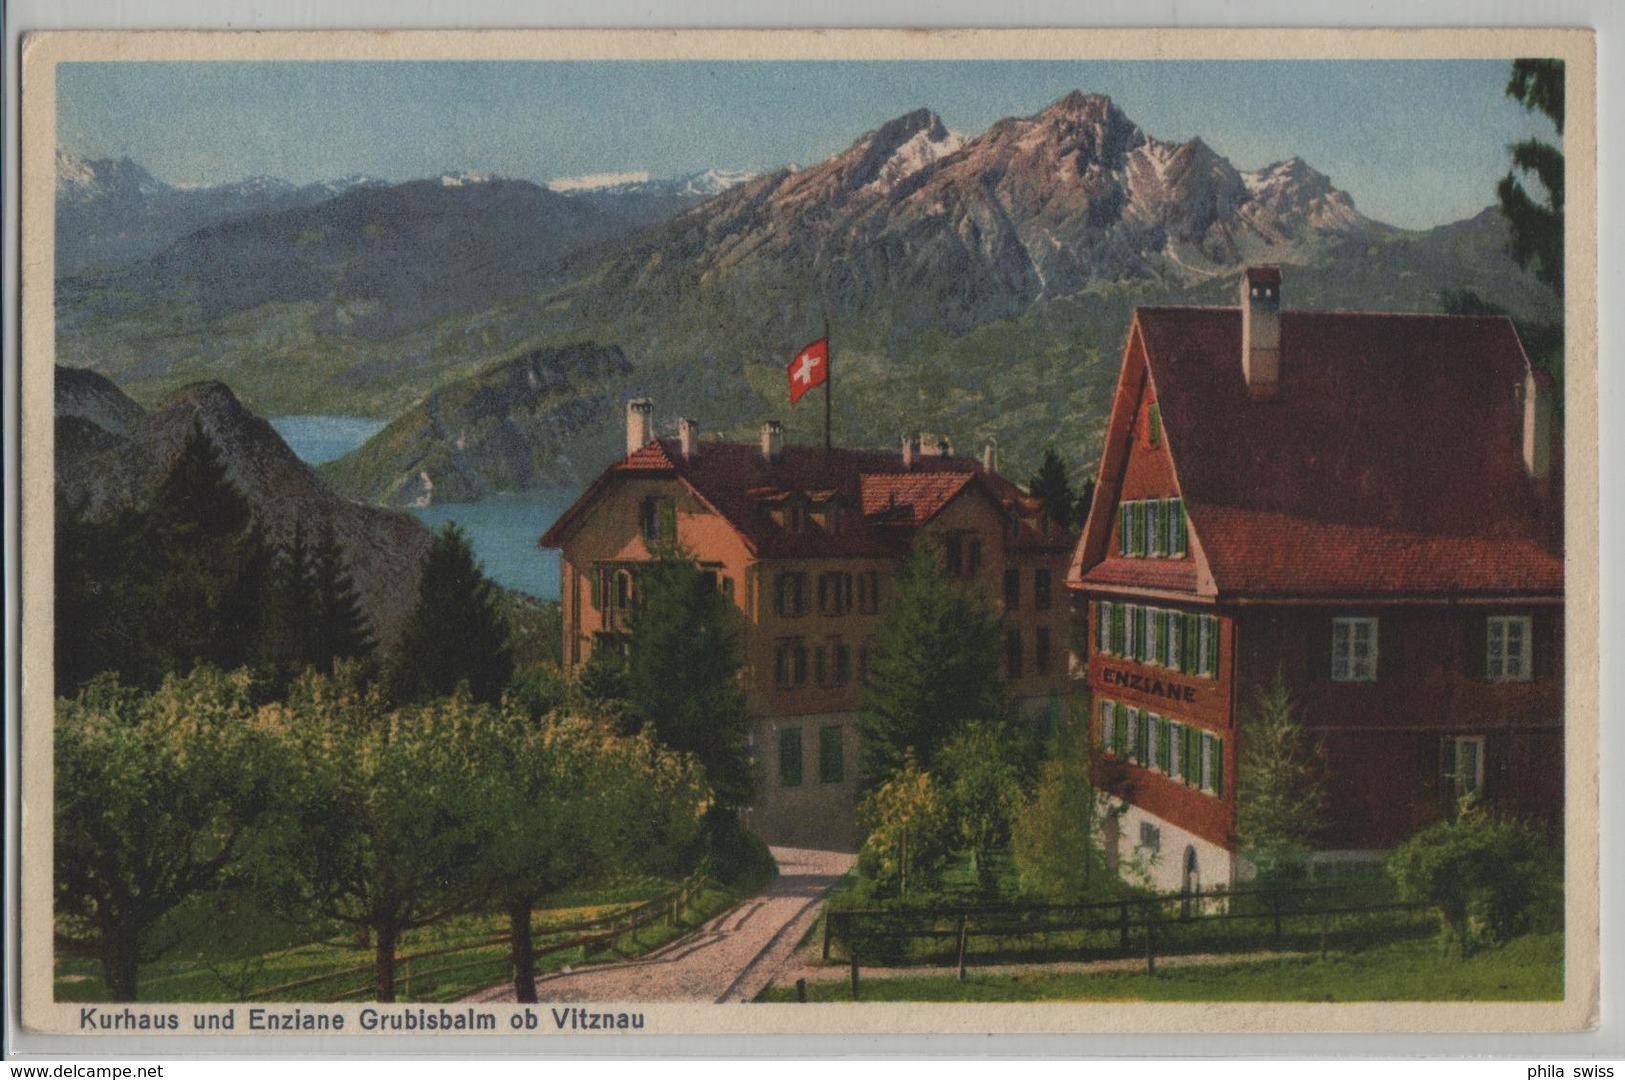 Kurhaus Und Enziane Grubisbalm Ob Vitznau - Photo: Globetrotter - LU Lucerne